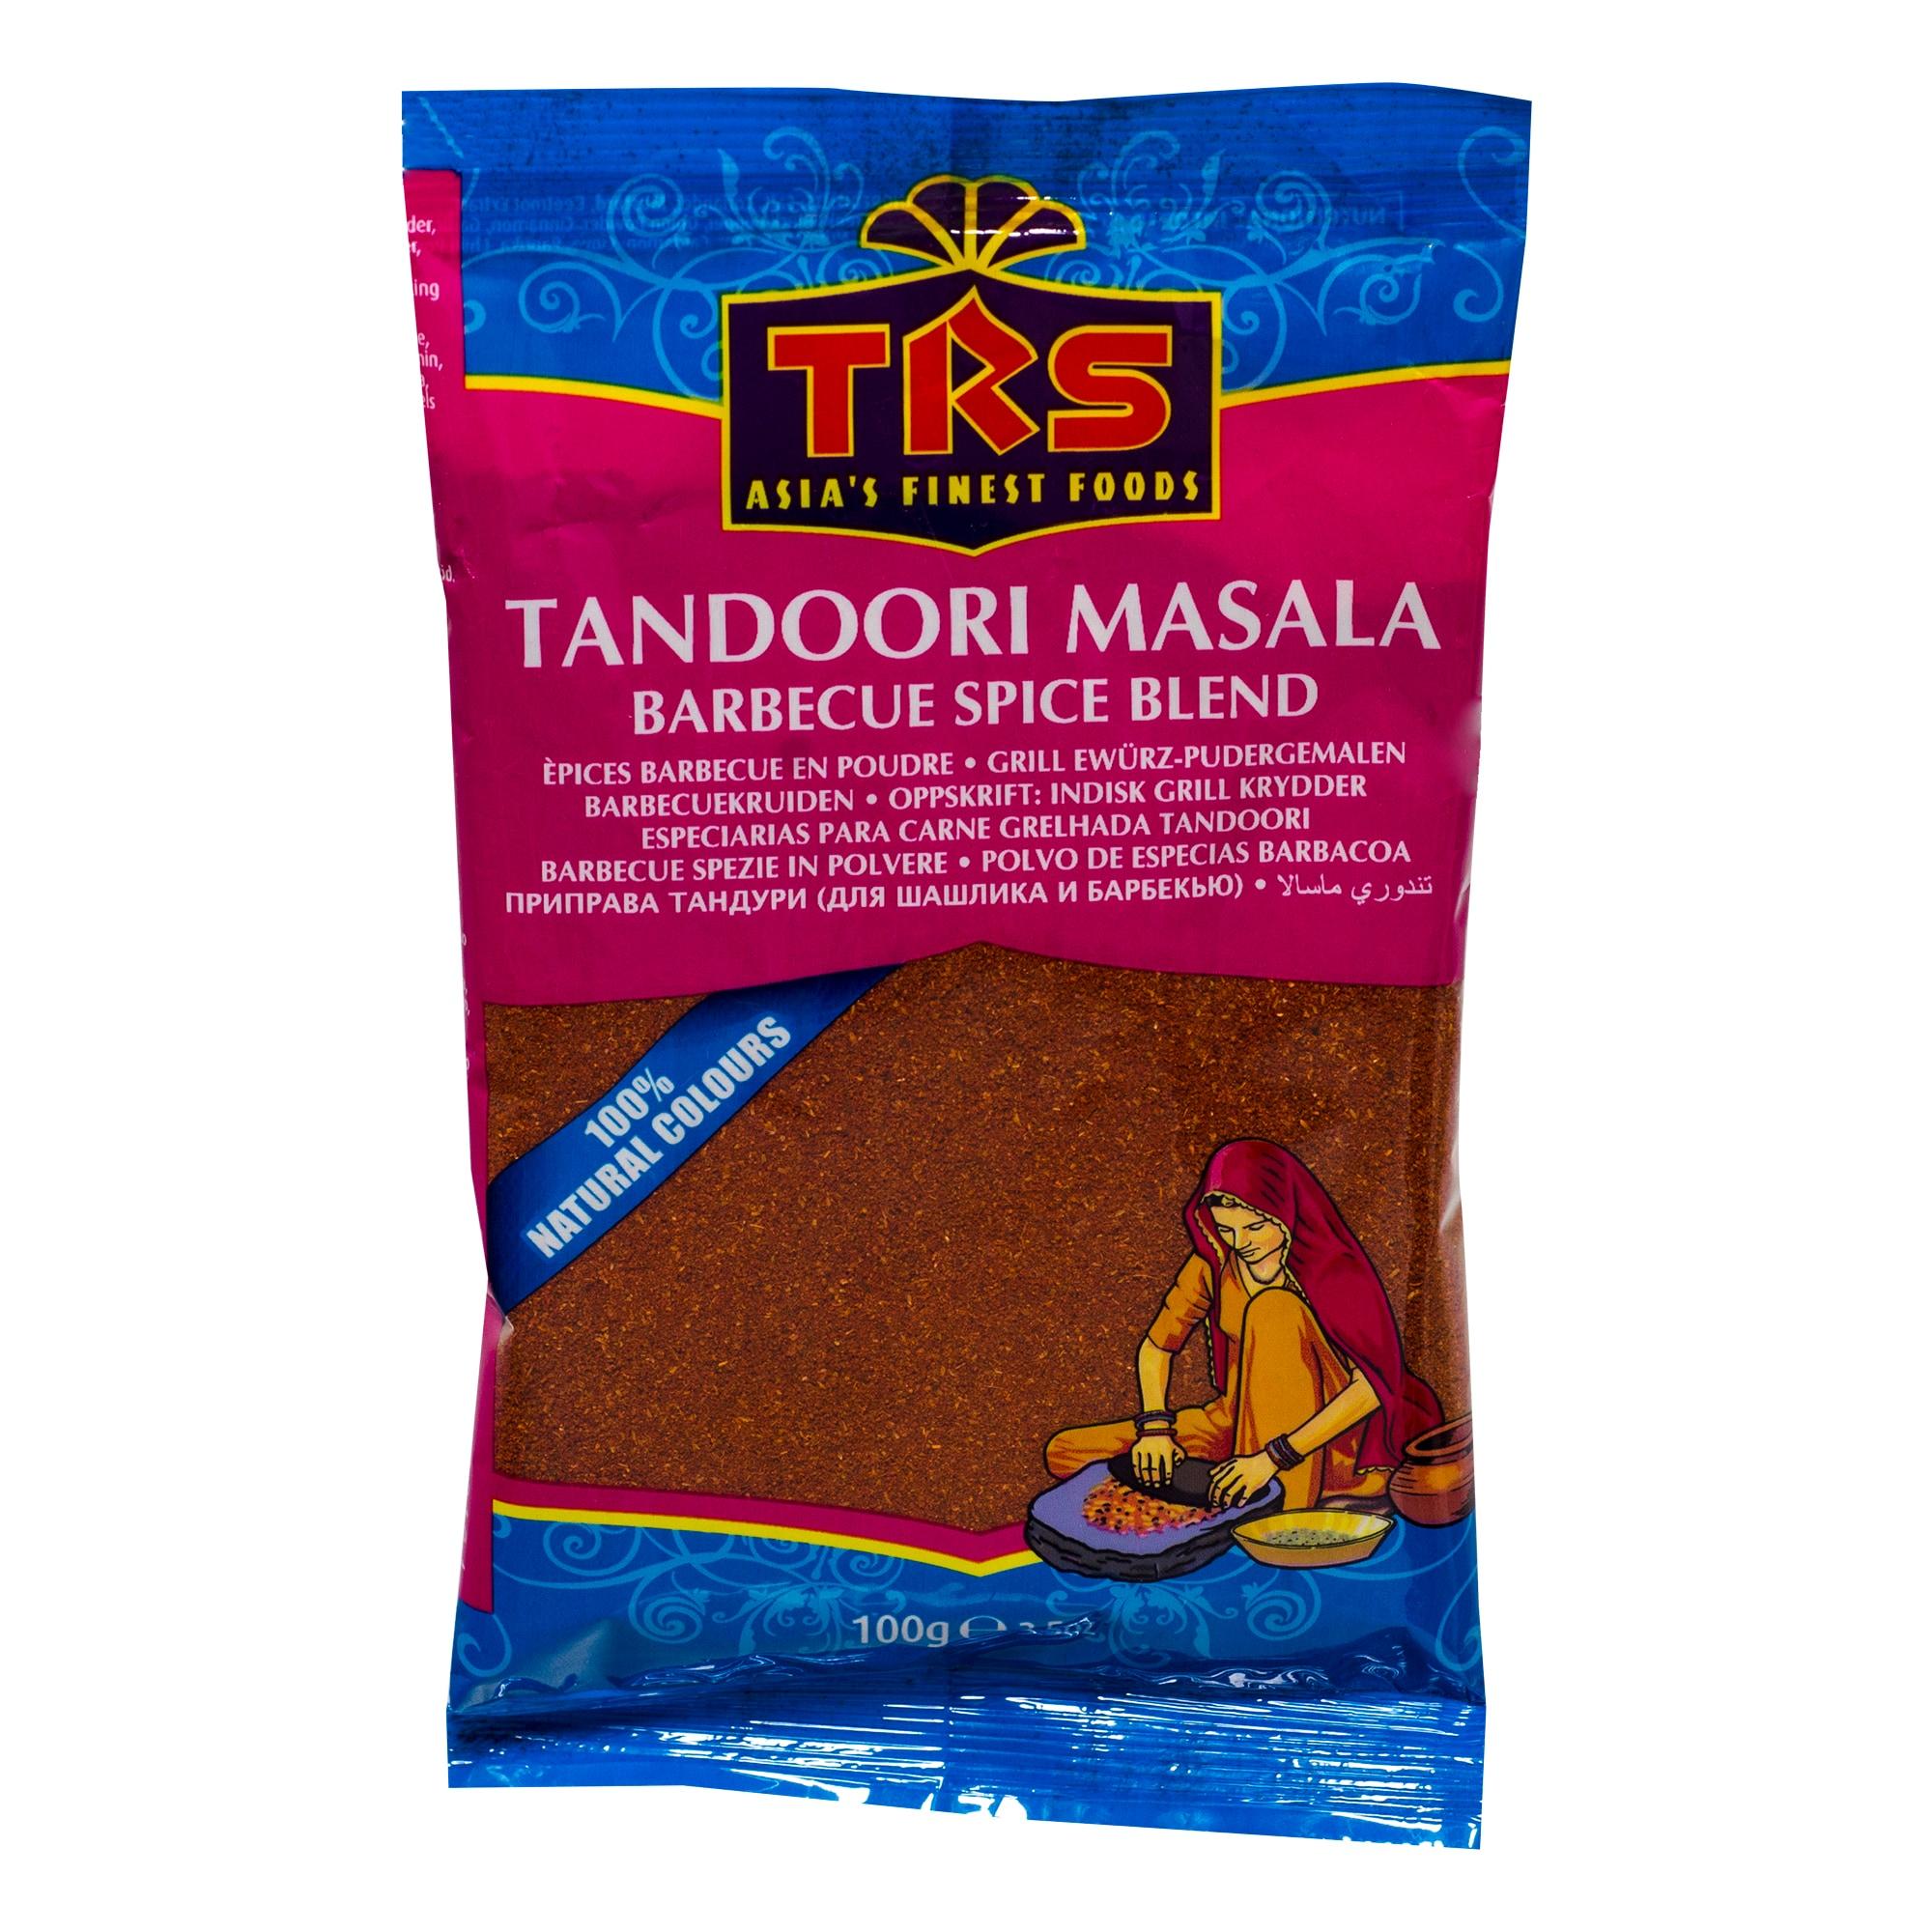 TRS Tandoori Masala Grillgewürzmischung 100g